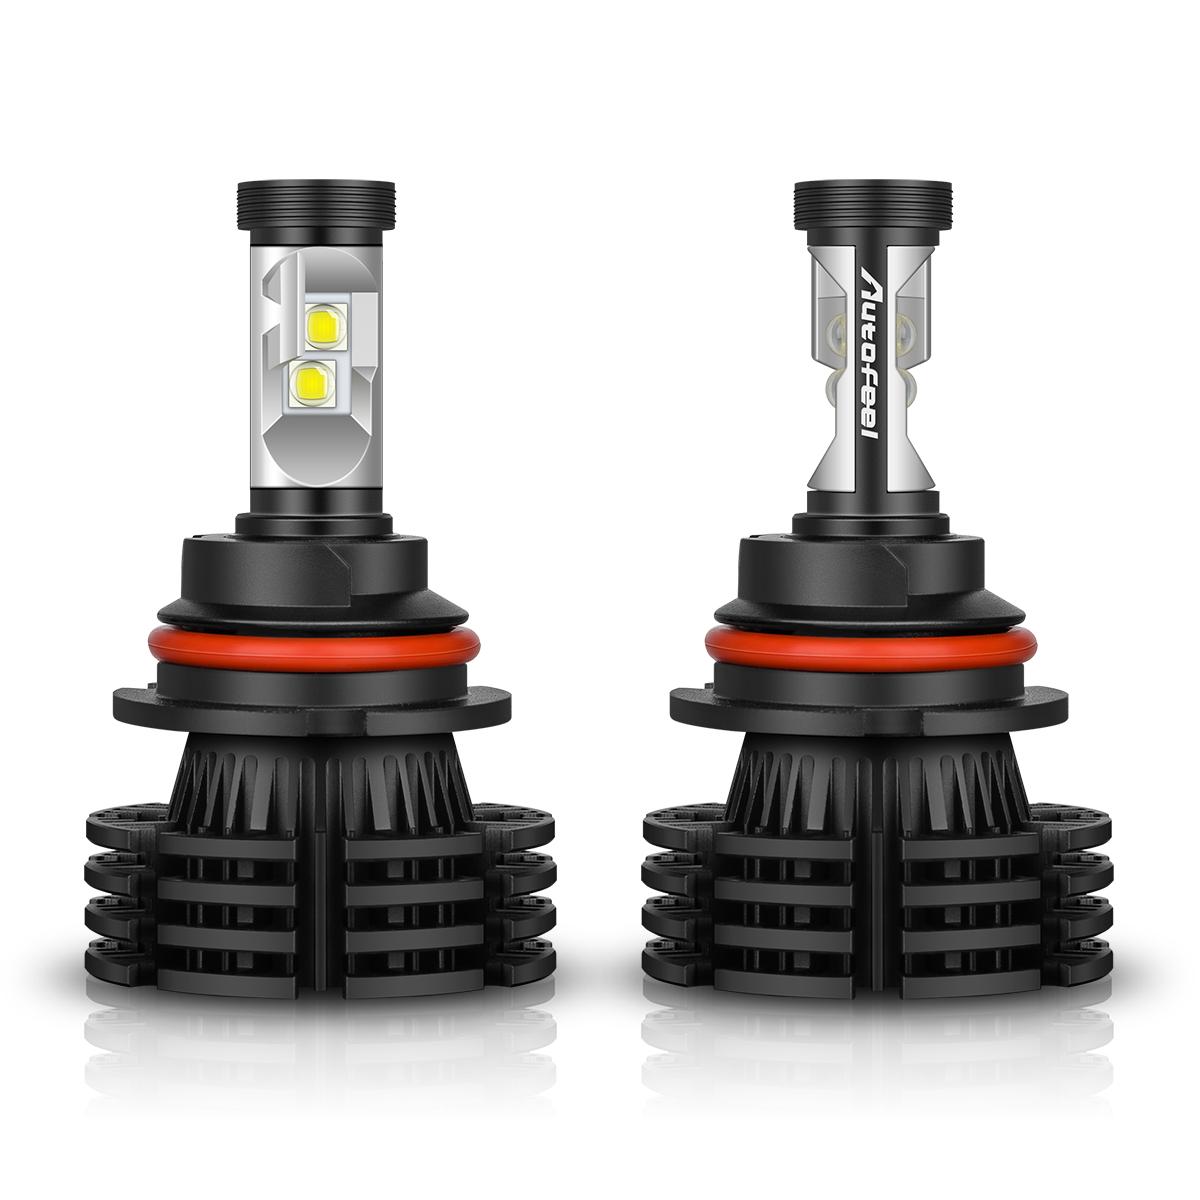 2x 9007 Hb5 1800w 279000lm Cree Led Headlight High Power Car Bulb Xentec Hid Light Wiring Diagram 6000k Lamp 12v